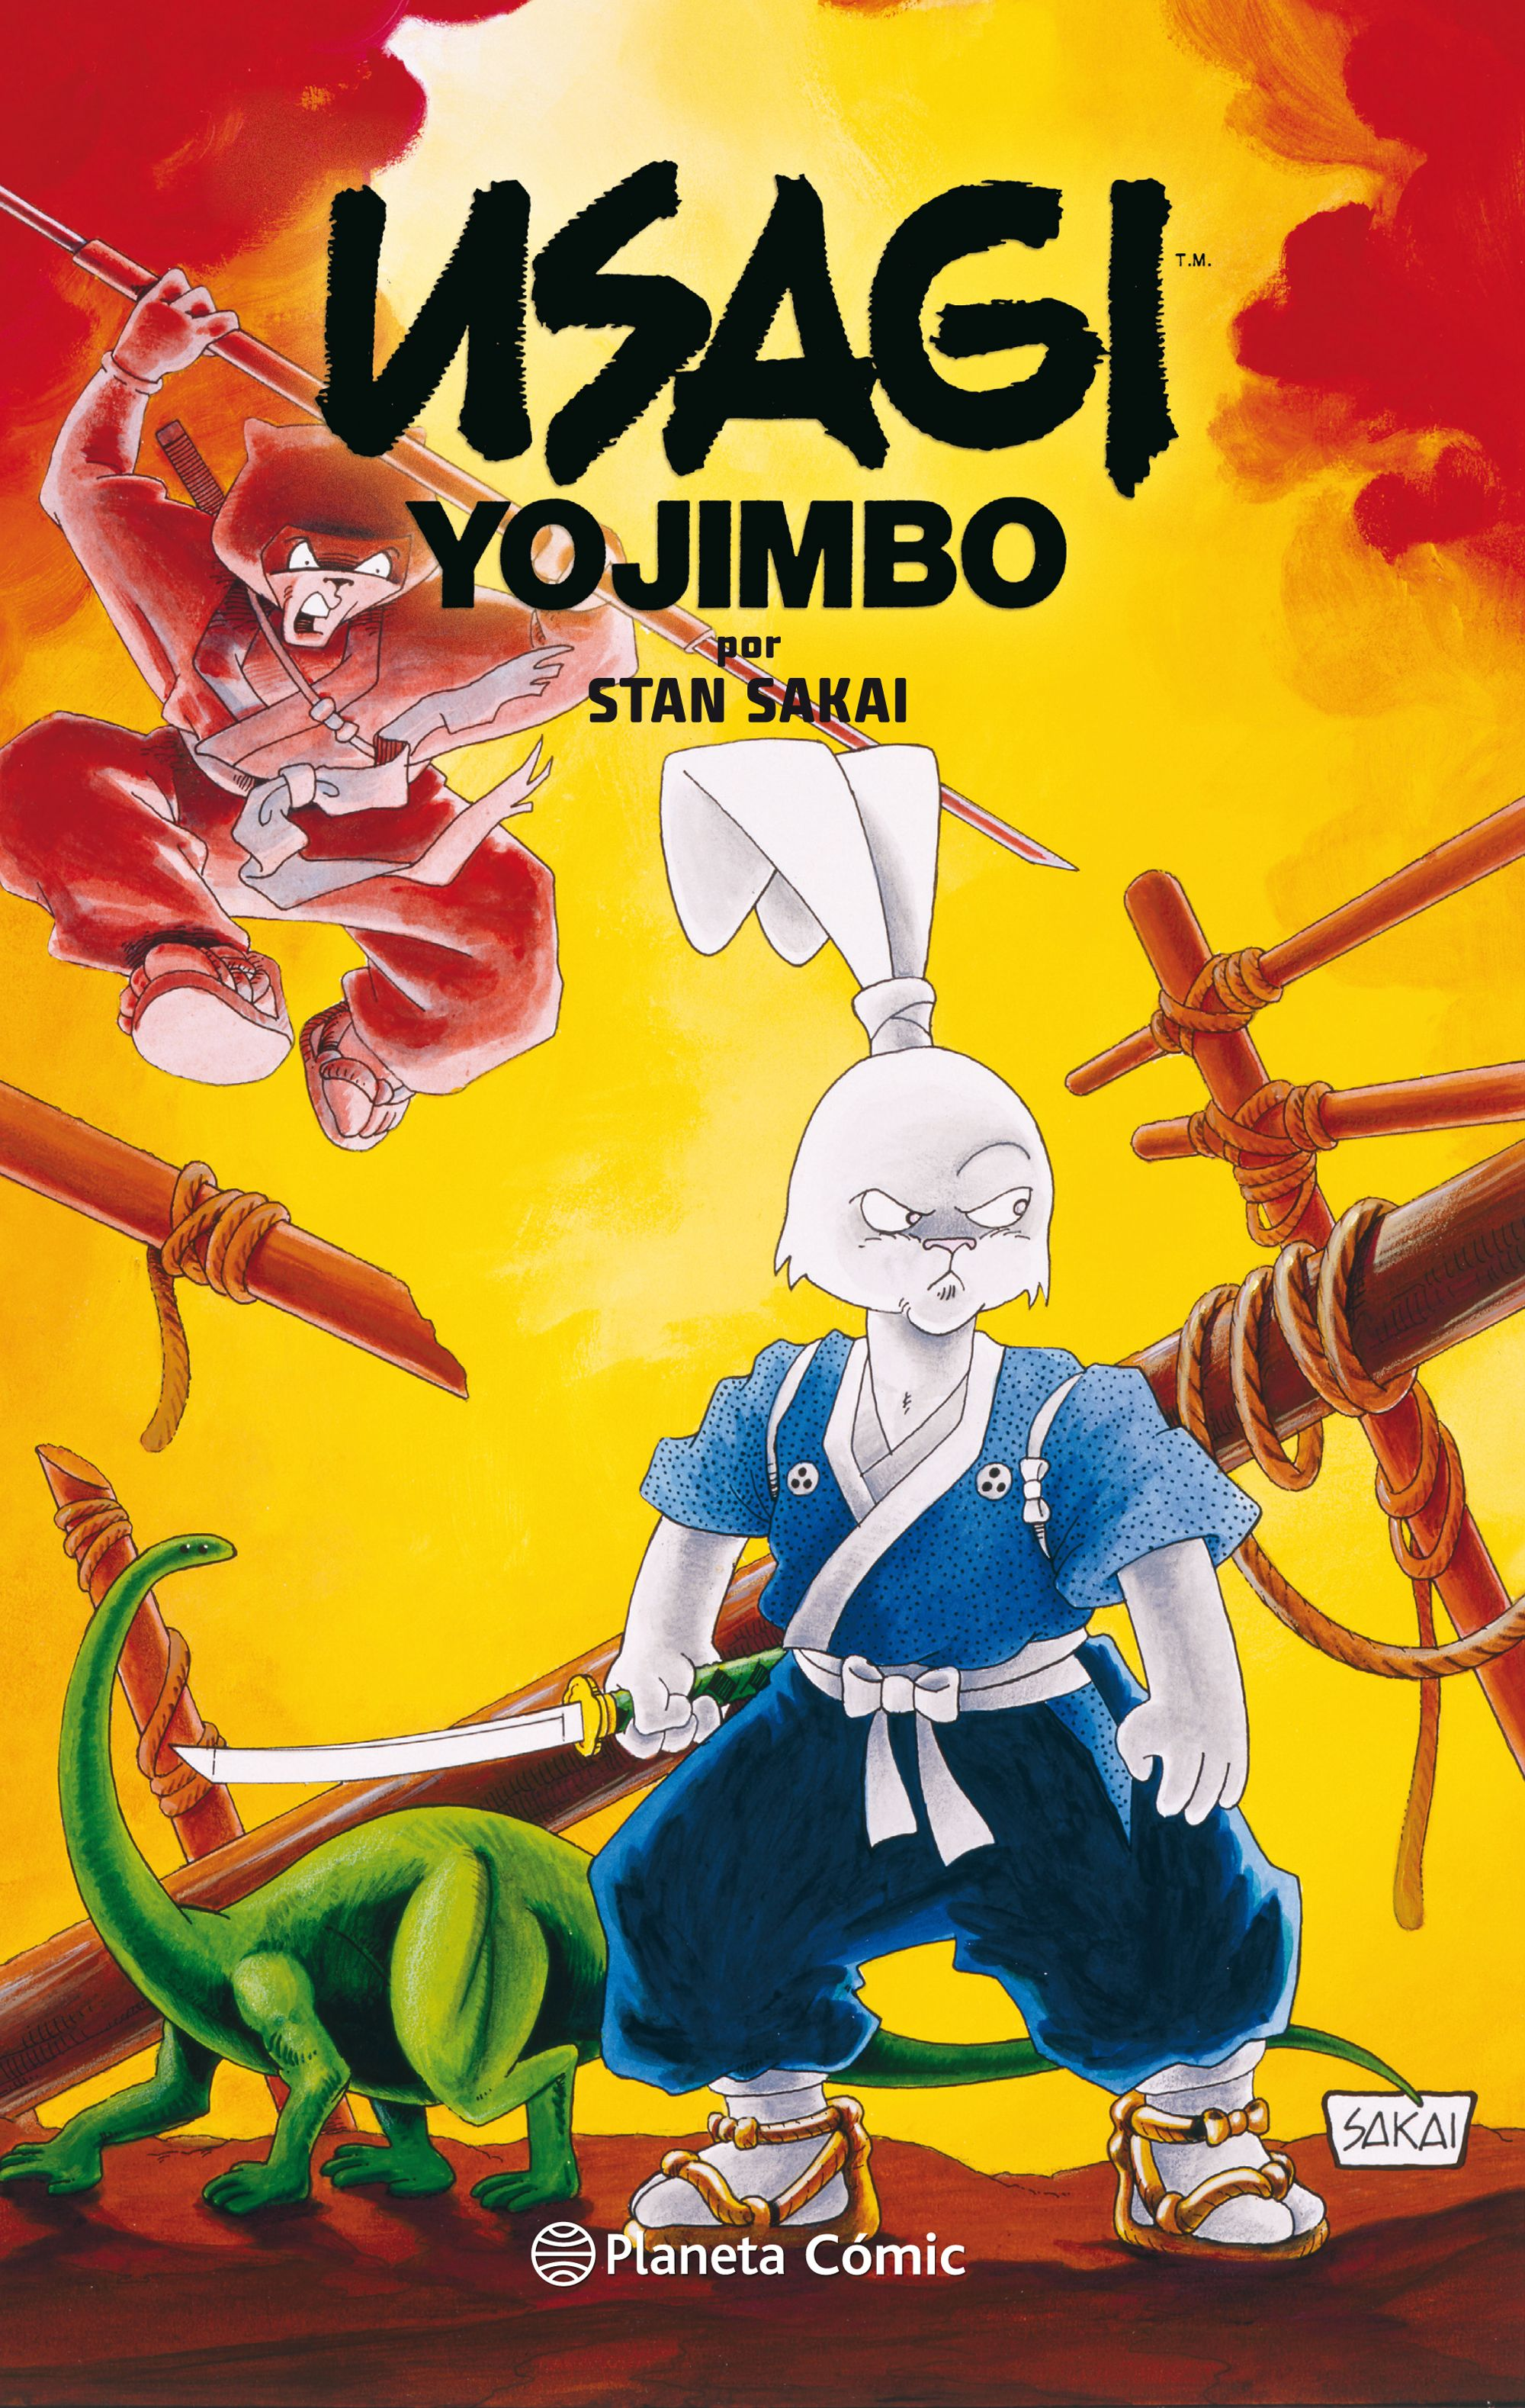 Usagi Yojimbo Fantagraphics Collection nº 02/02 - Stan Sakai - Planeta Deagostini Cómics